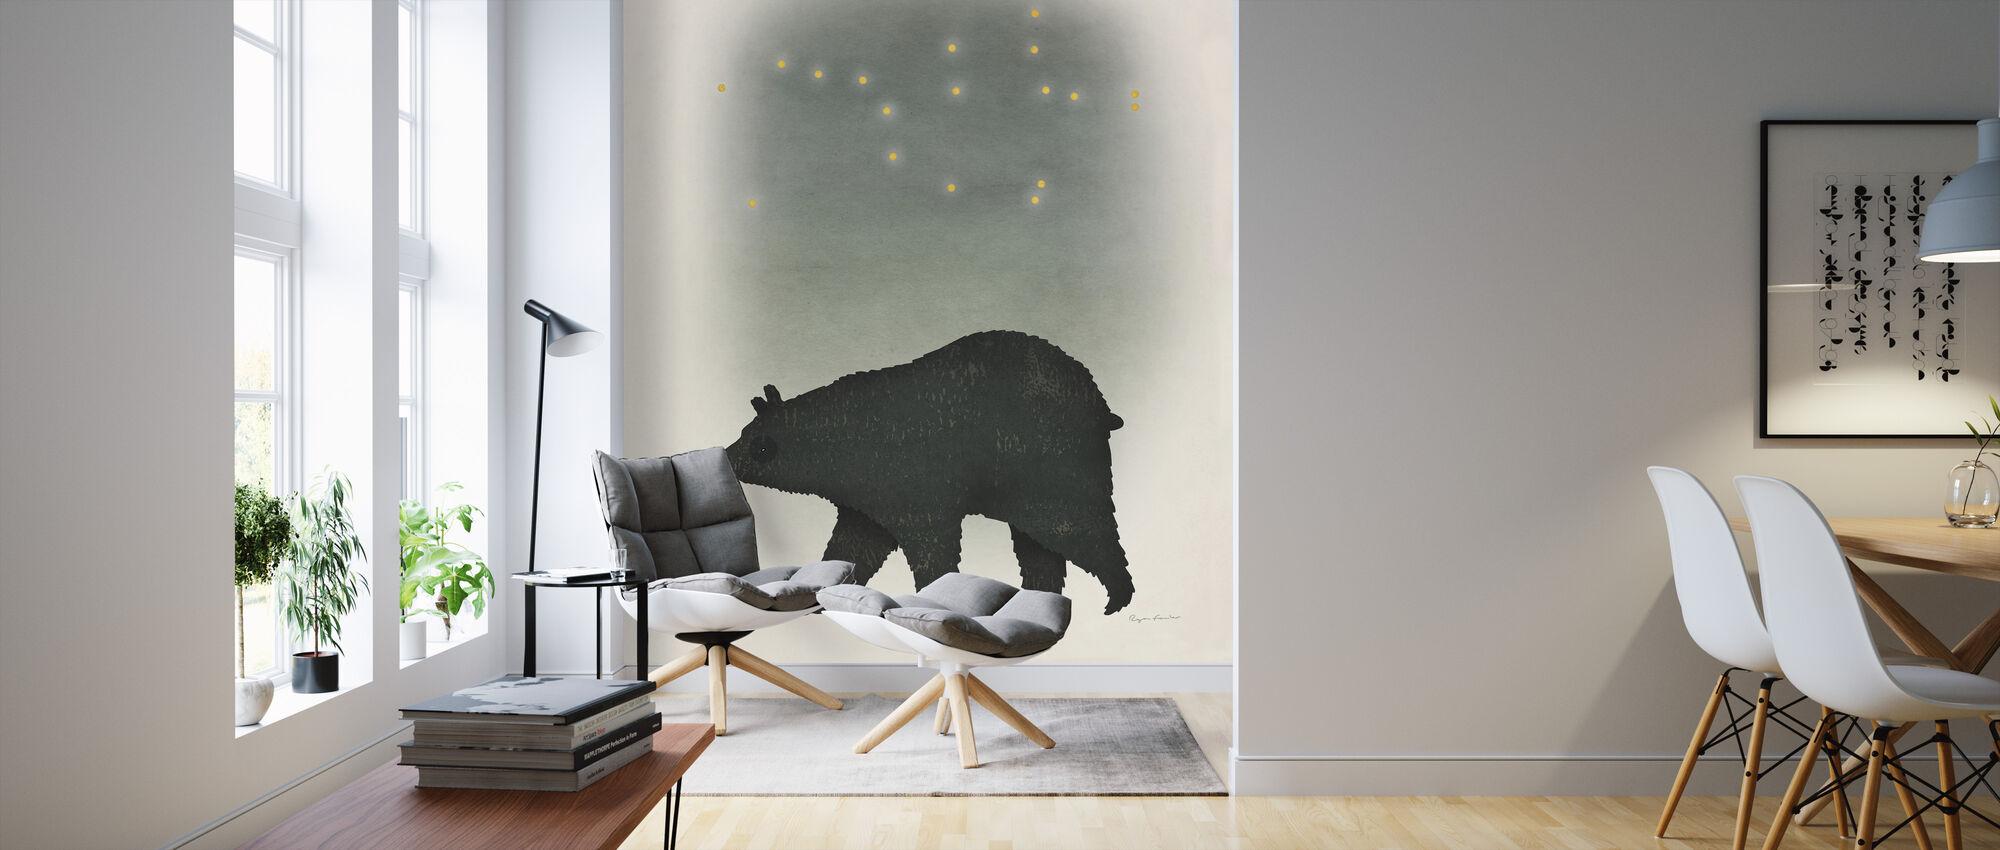 ursa major fototapete nach ma photowall. Black Bedroom Furniture Sets. Home Design Ideas